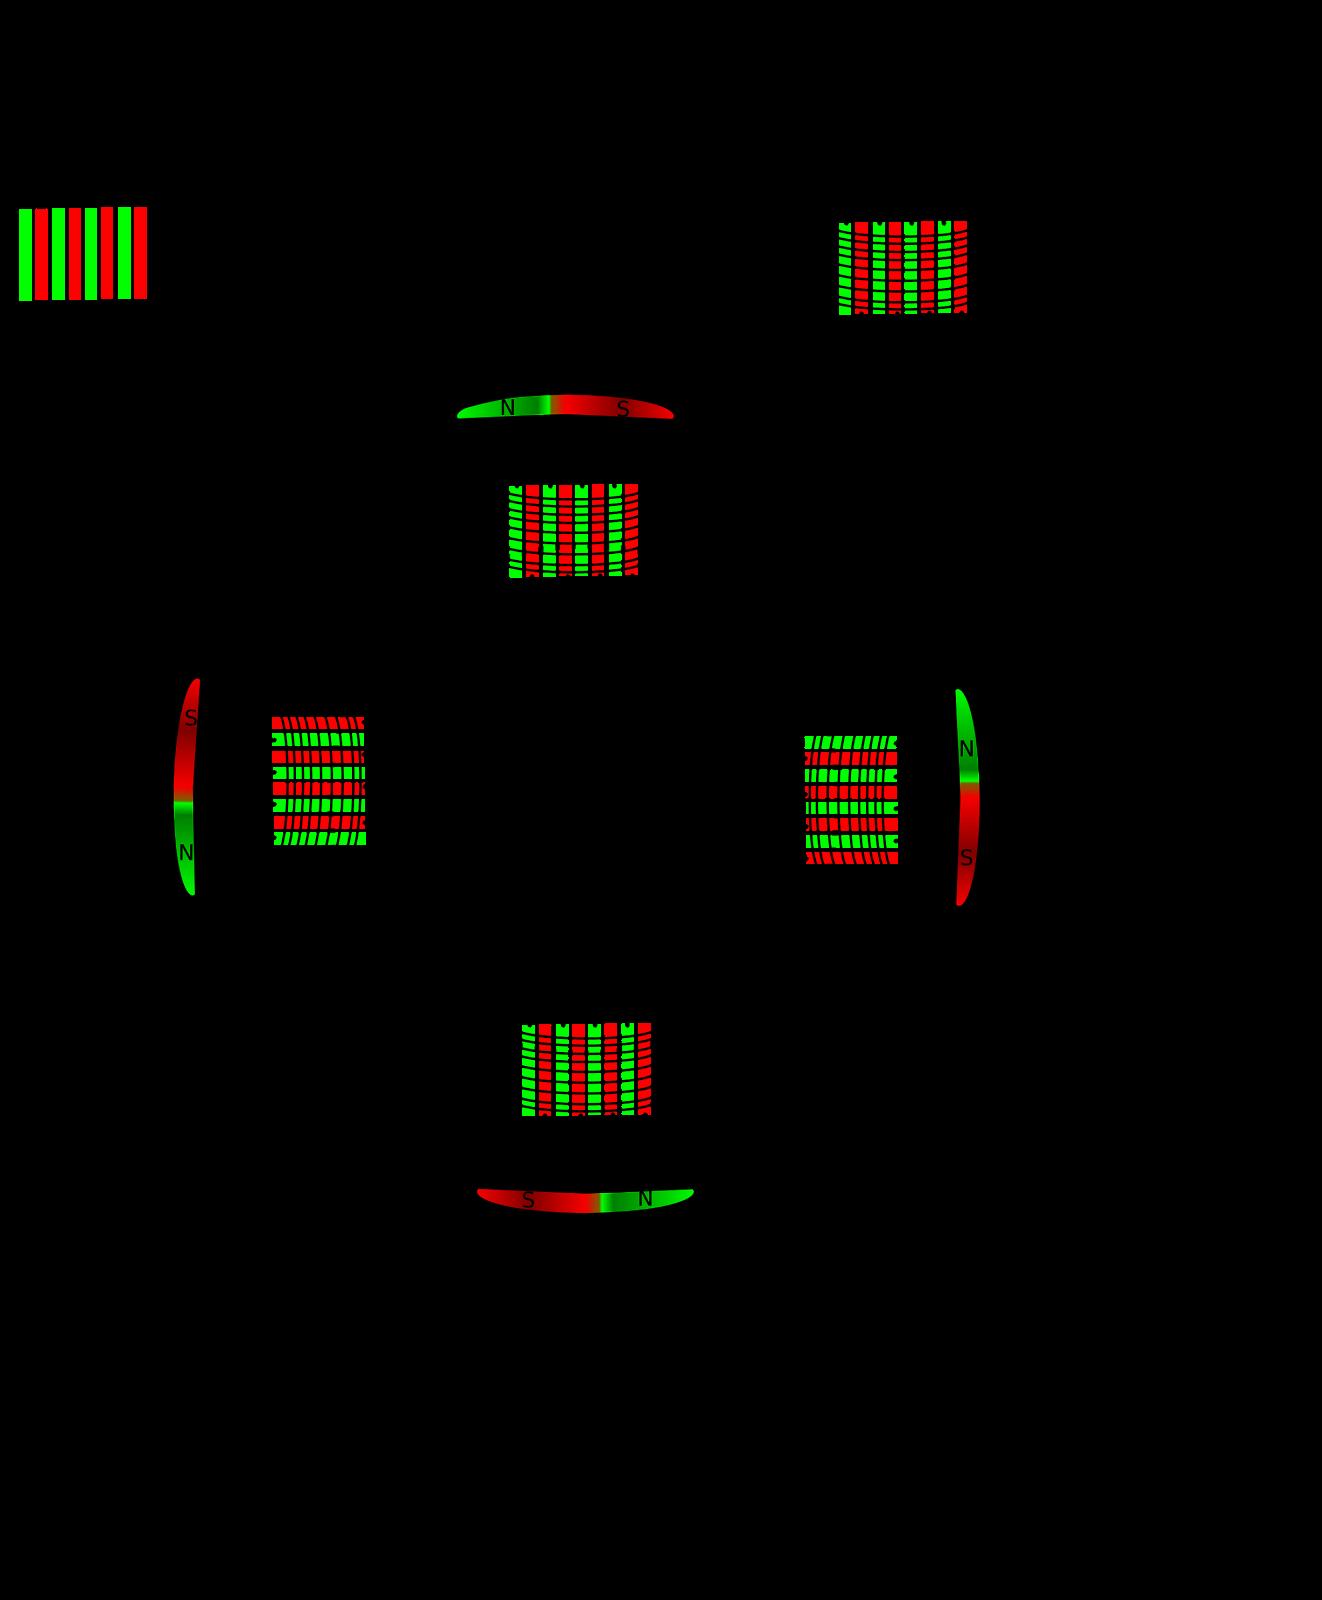 Drehstromgenerator kapazitiv Mitkoppeln | Teslapyramide